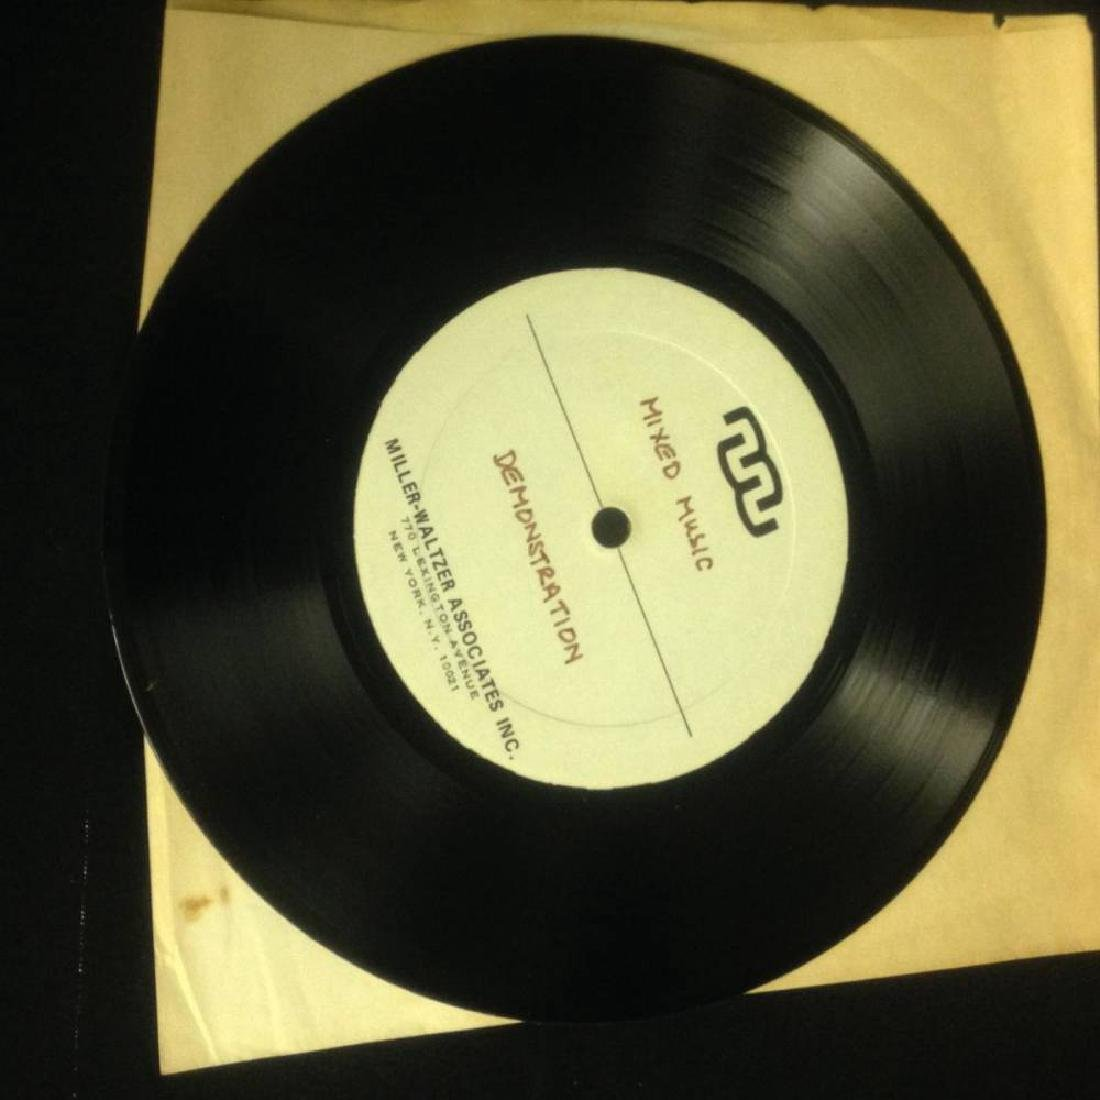 Pair Of Demo Records Judy Garland And Mixed Music - 4